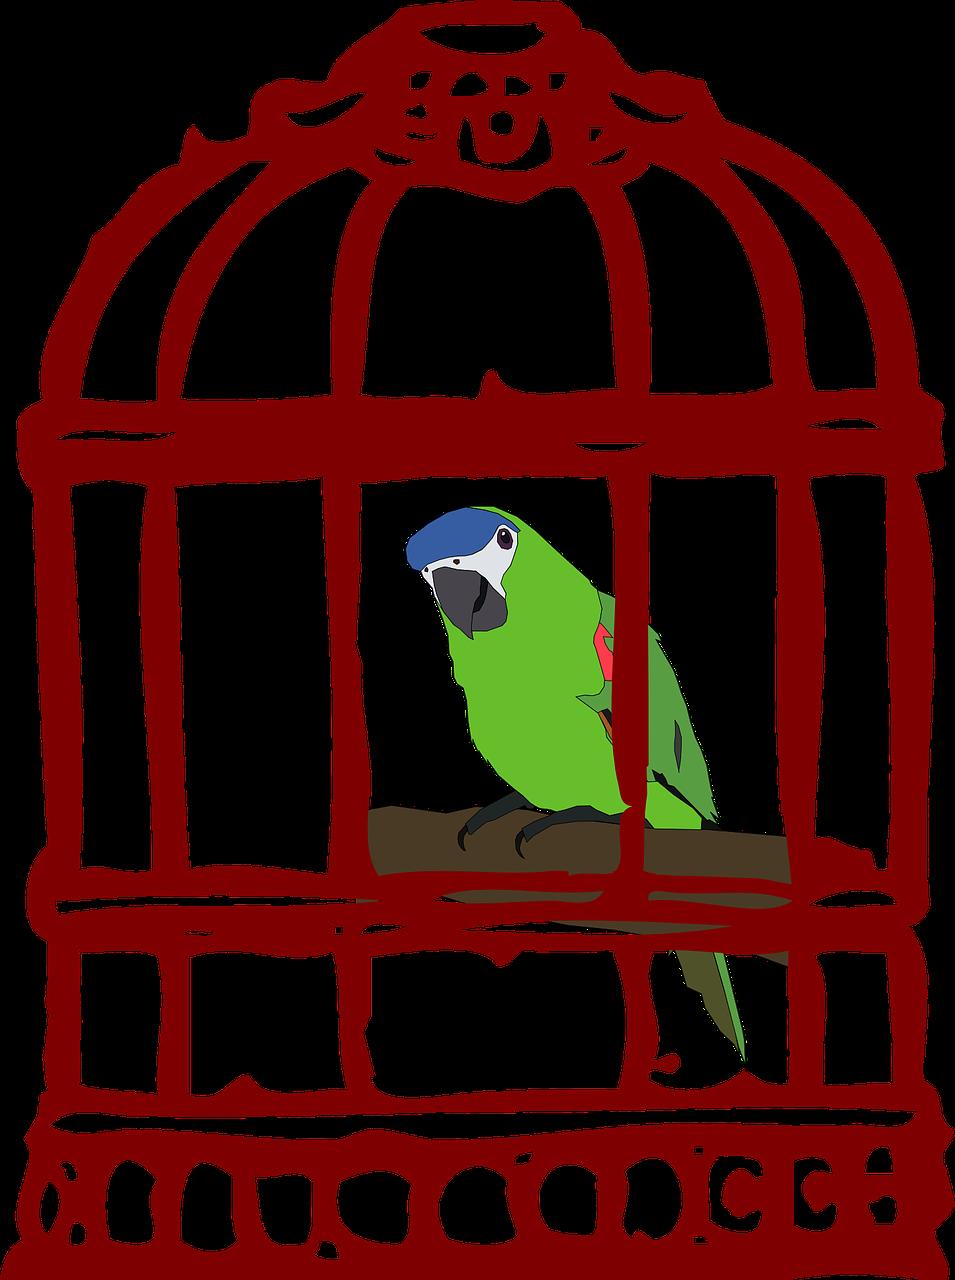 Pin By Serenity Studio Art On Bird Cages Public Domain Small Bird Cage Cartoon Clip Art Bird Cage